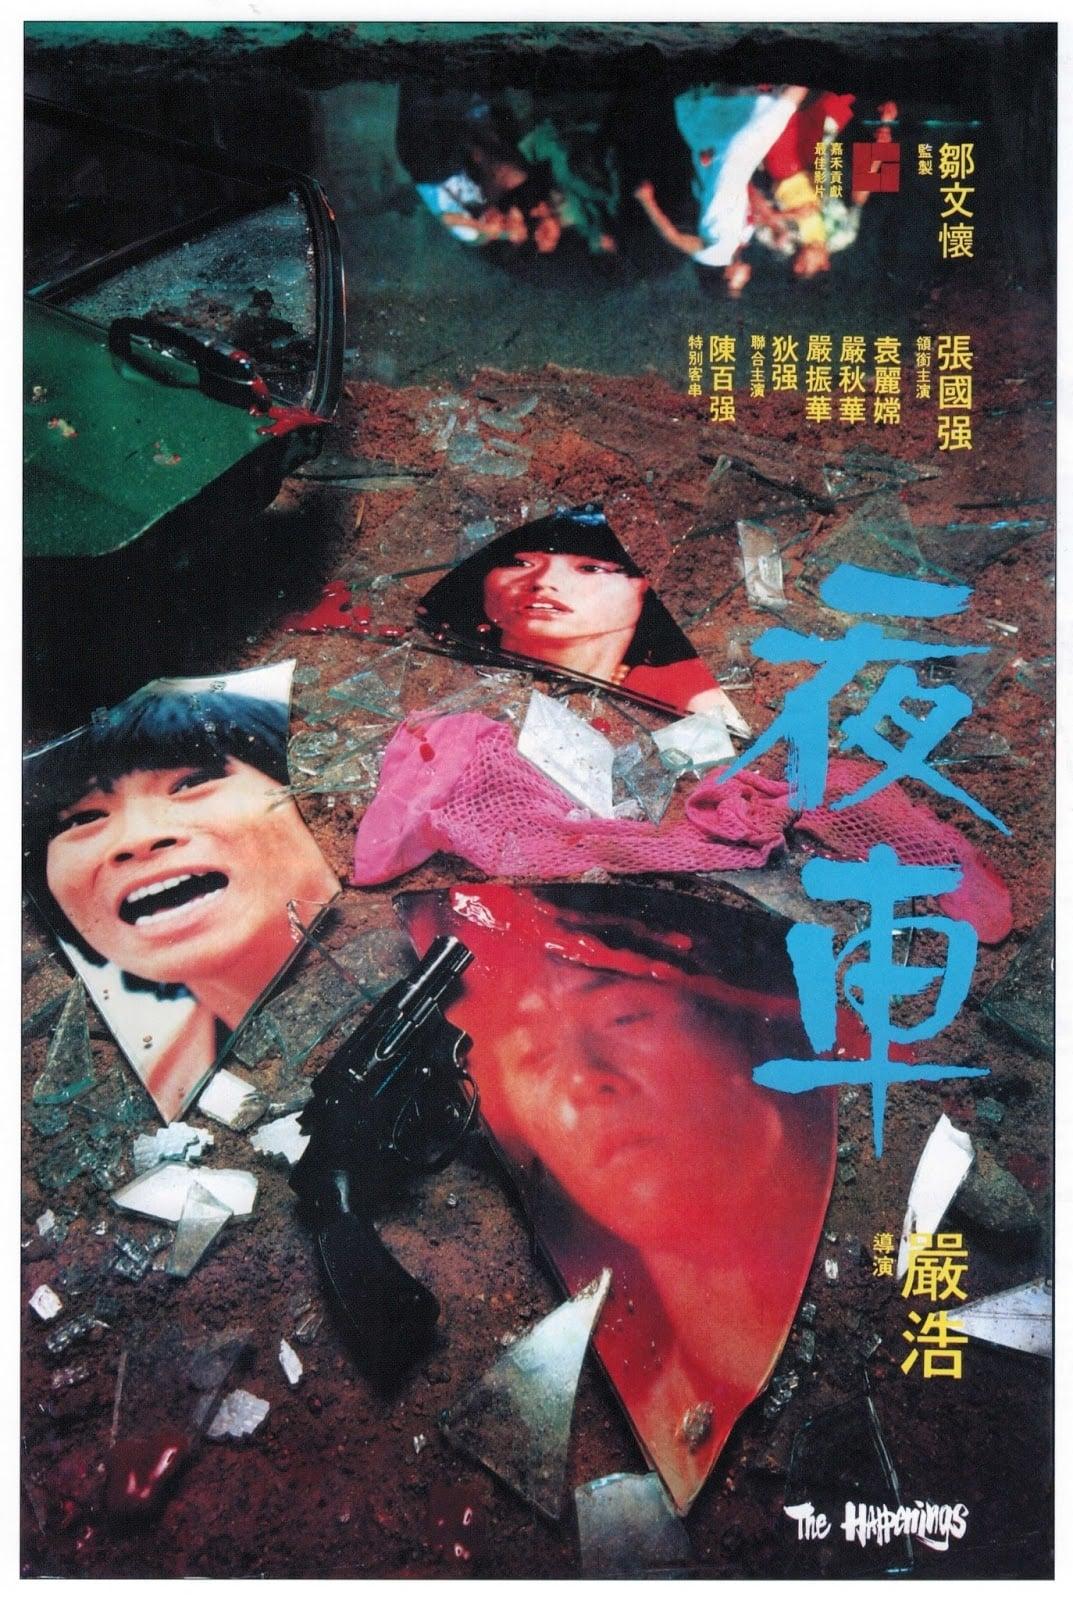 The Happenings (1980)